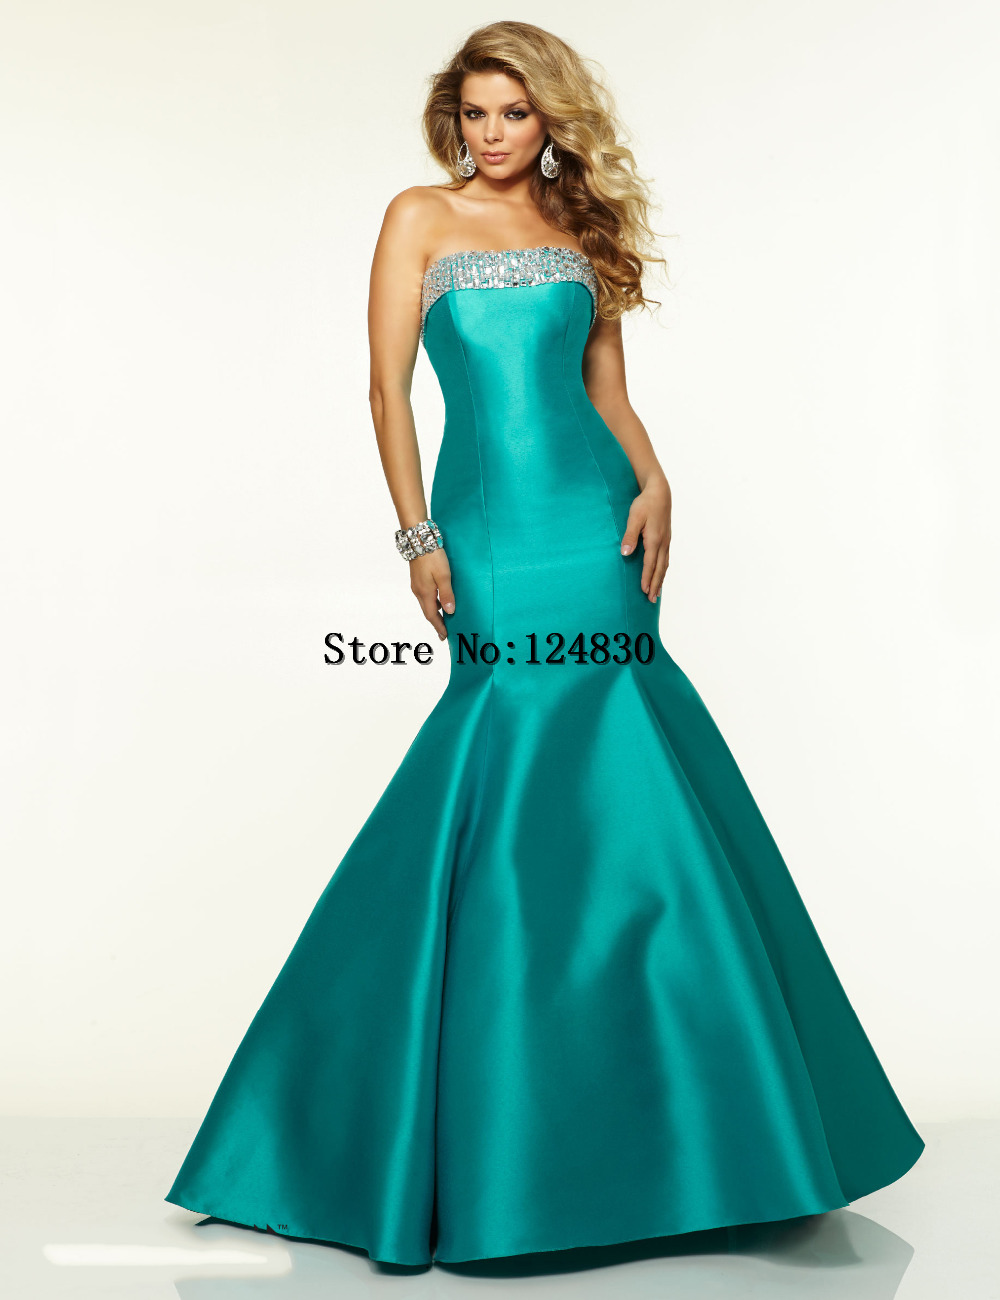 Free Shipping Cheap 2016 Plus Size Mermaid Prom Dresses Floor ...